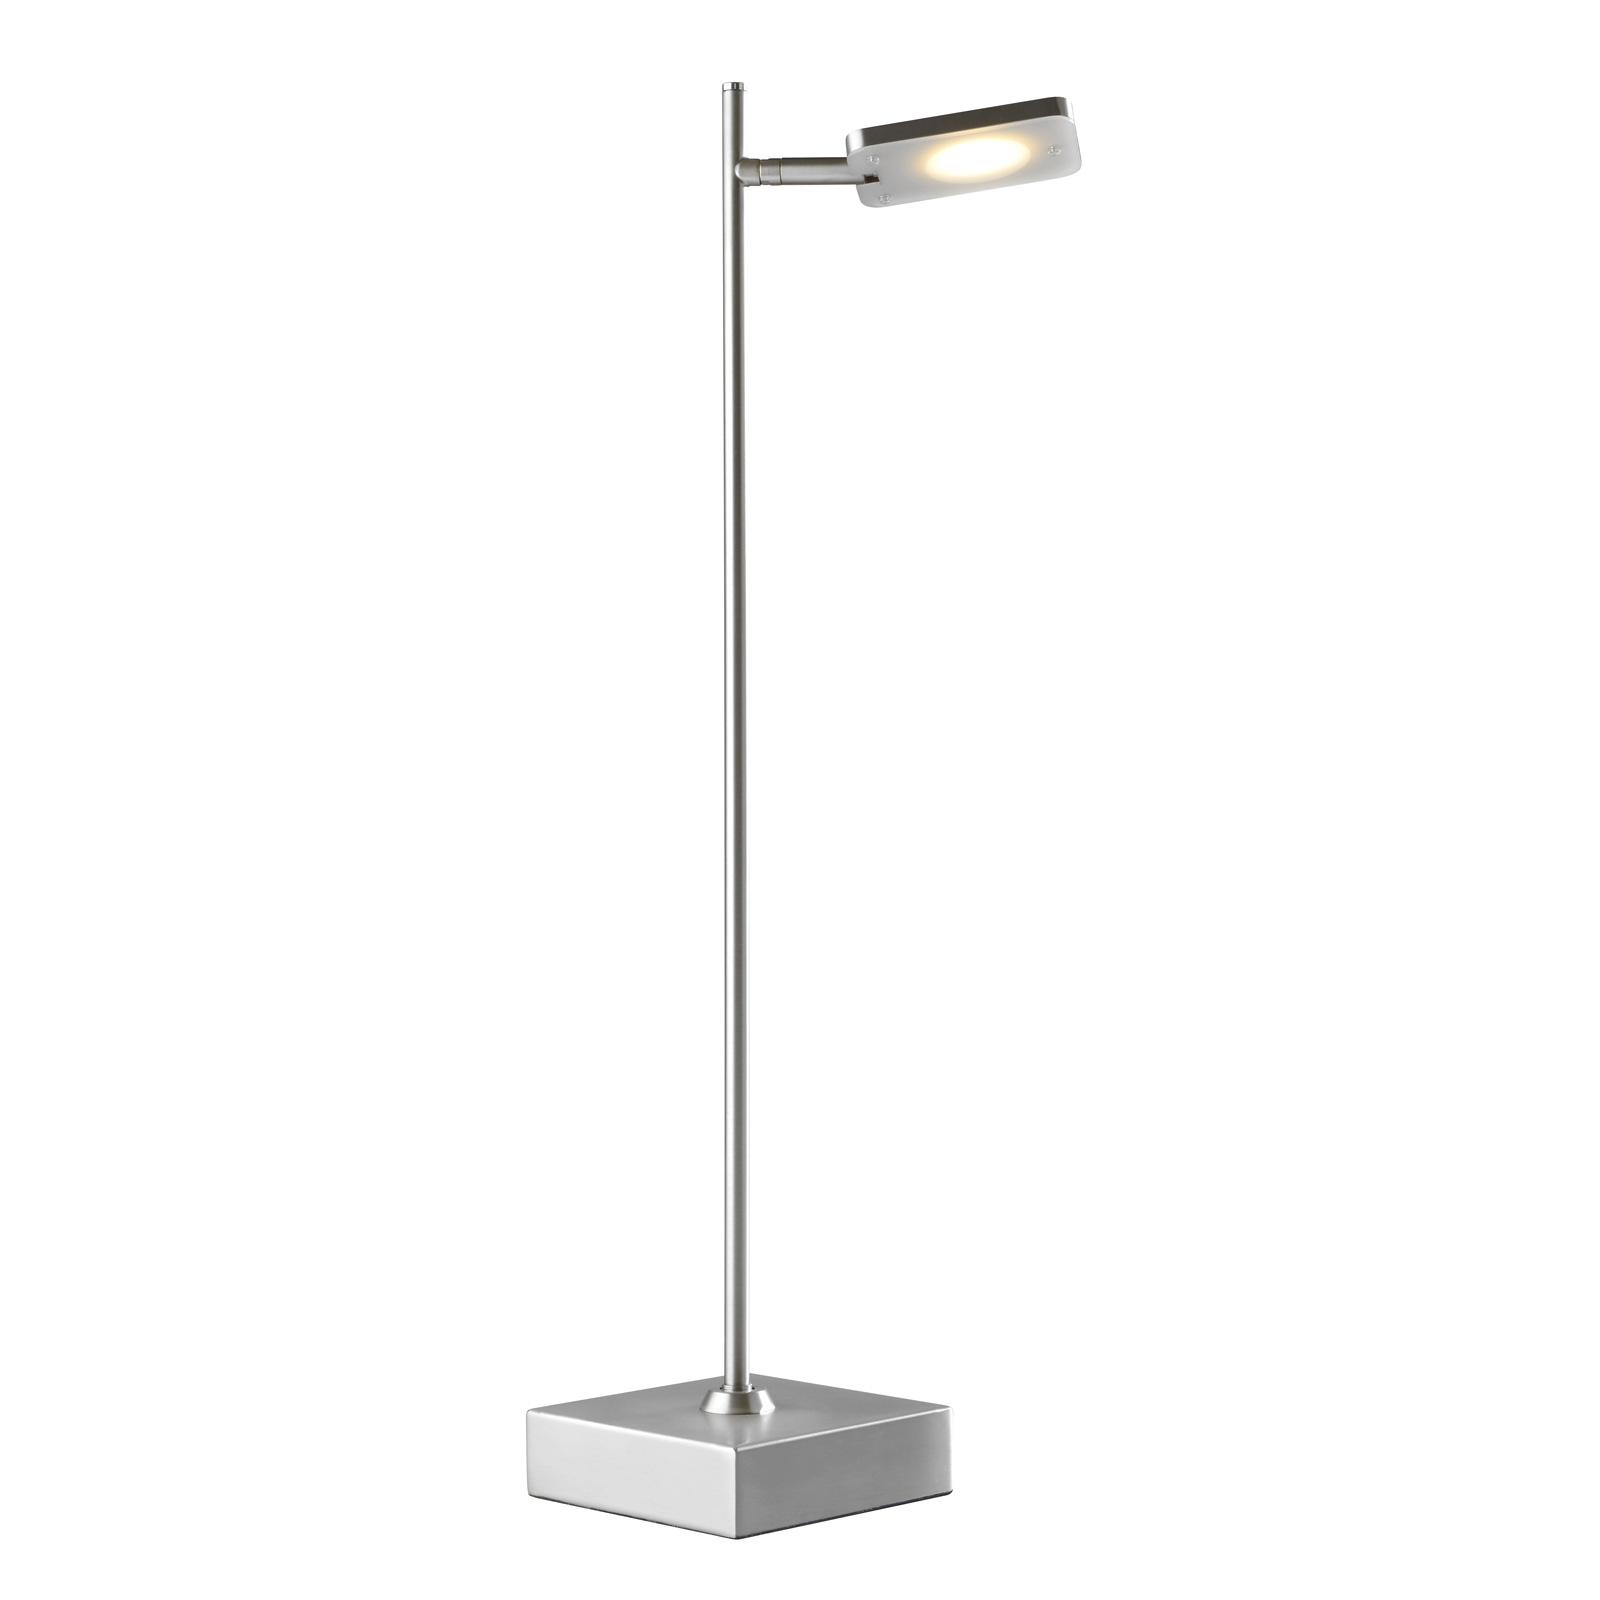 LED-pöytälamppu Quad, himmennin, 1-lamp. alumiini